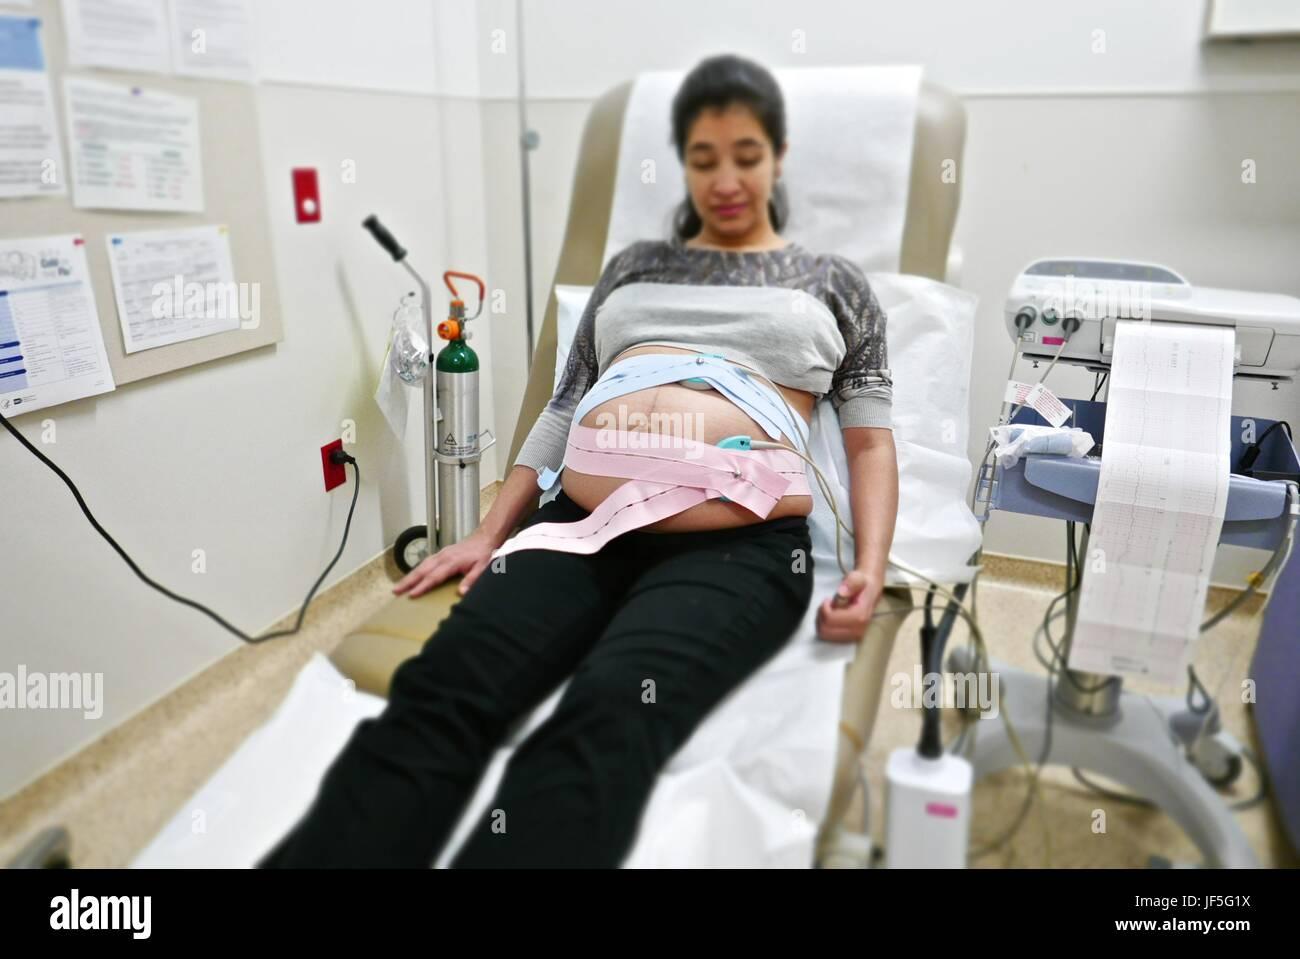 A 41-week pregnant Hispanic woman having a fetal non-stress test, NST. - Stock Image